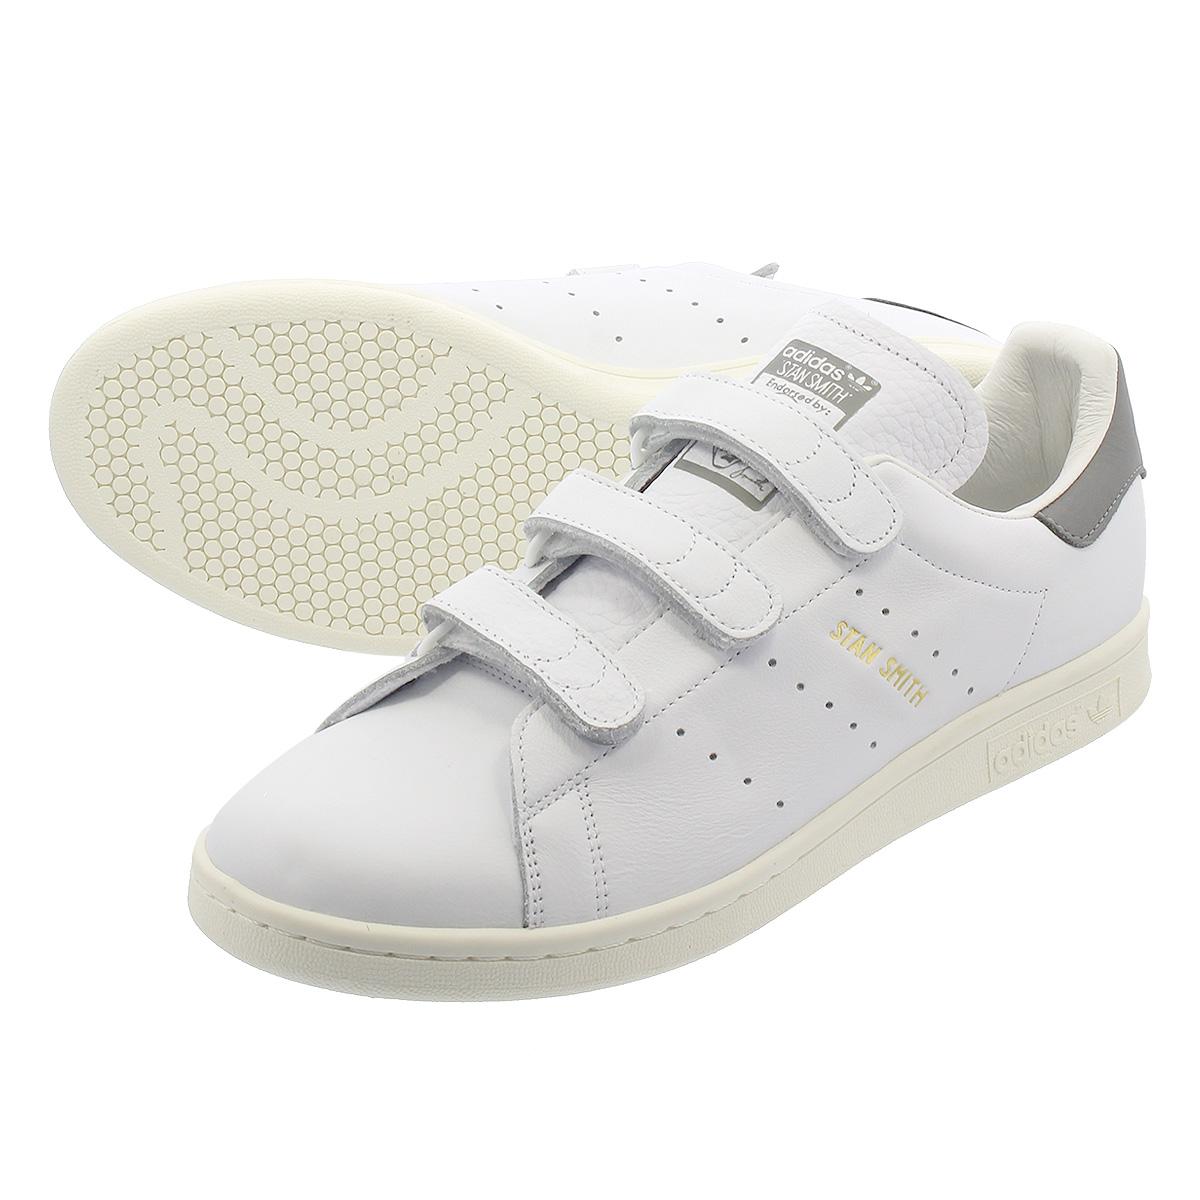 adidas STAN SMITH CF 【adidas Originals】 アディダス スタンスミス CF RUNNING WHITE/RUNNING WHITE/GREY ee8542